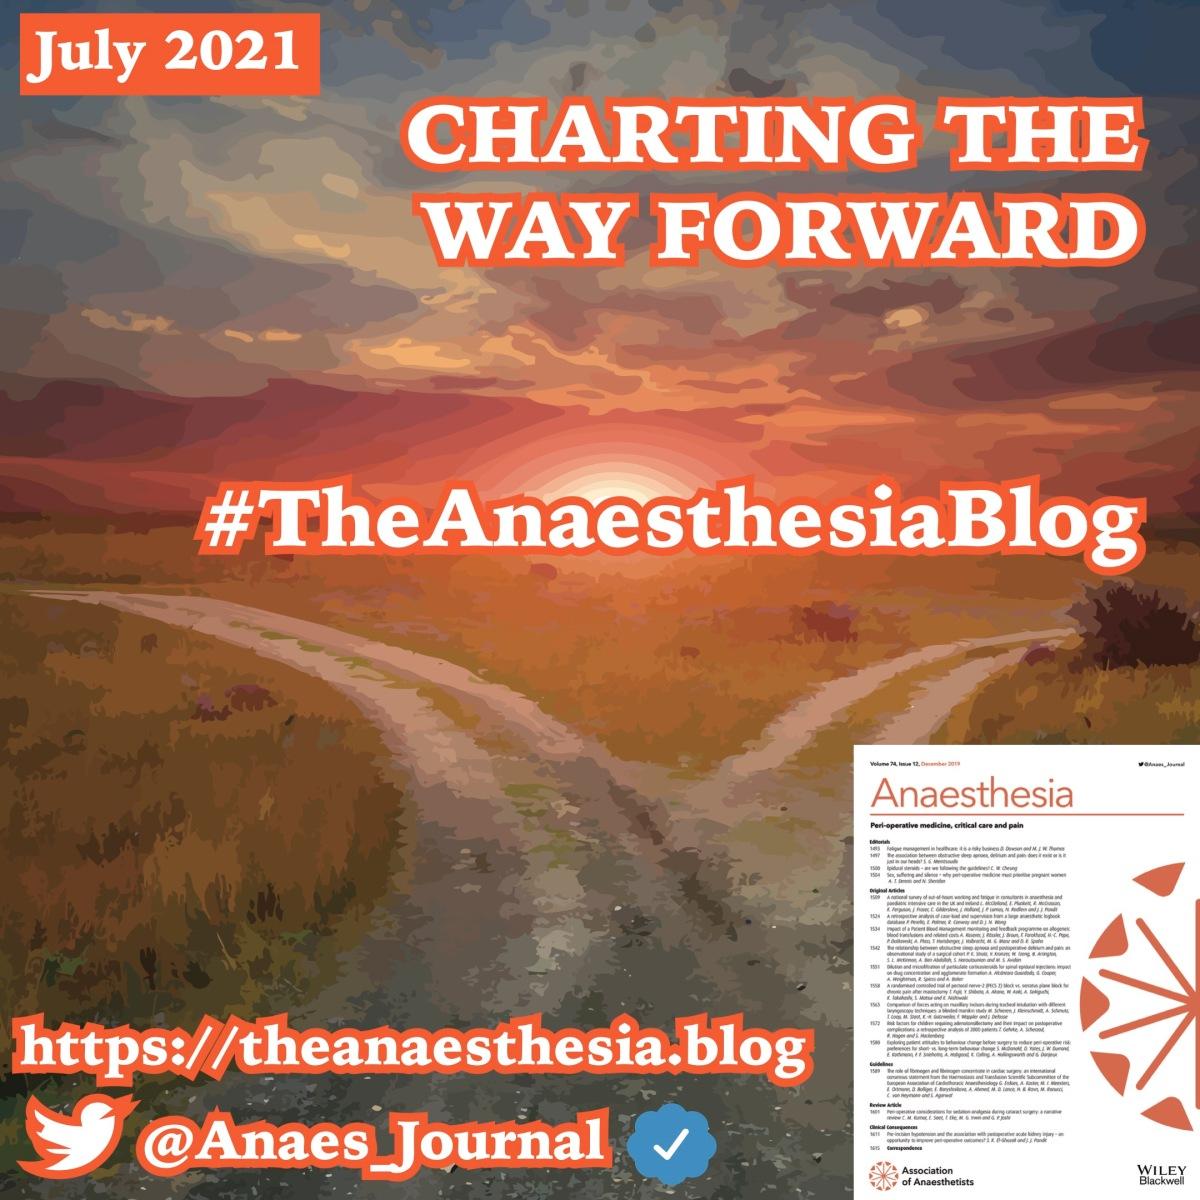 Charting the wayforward